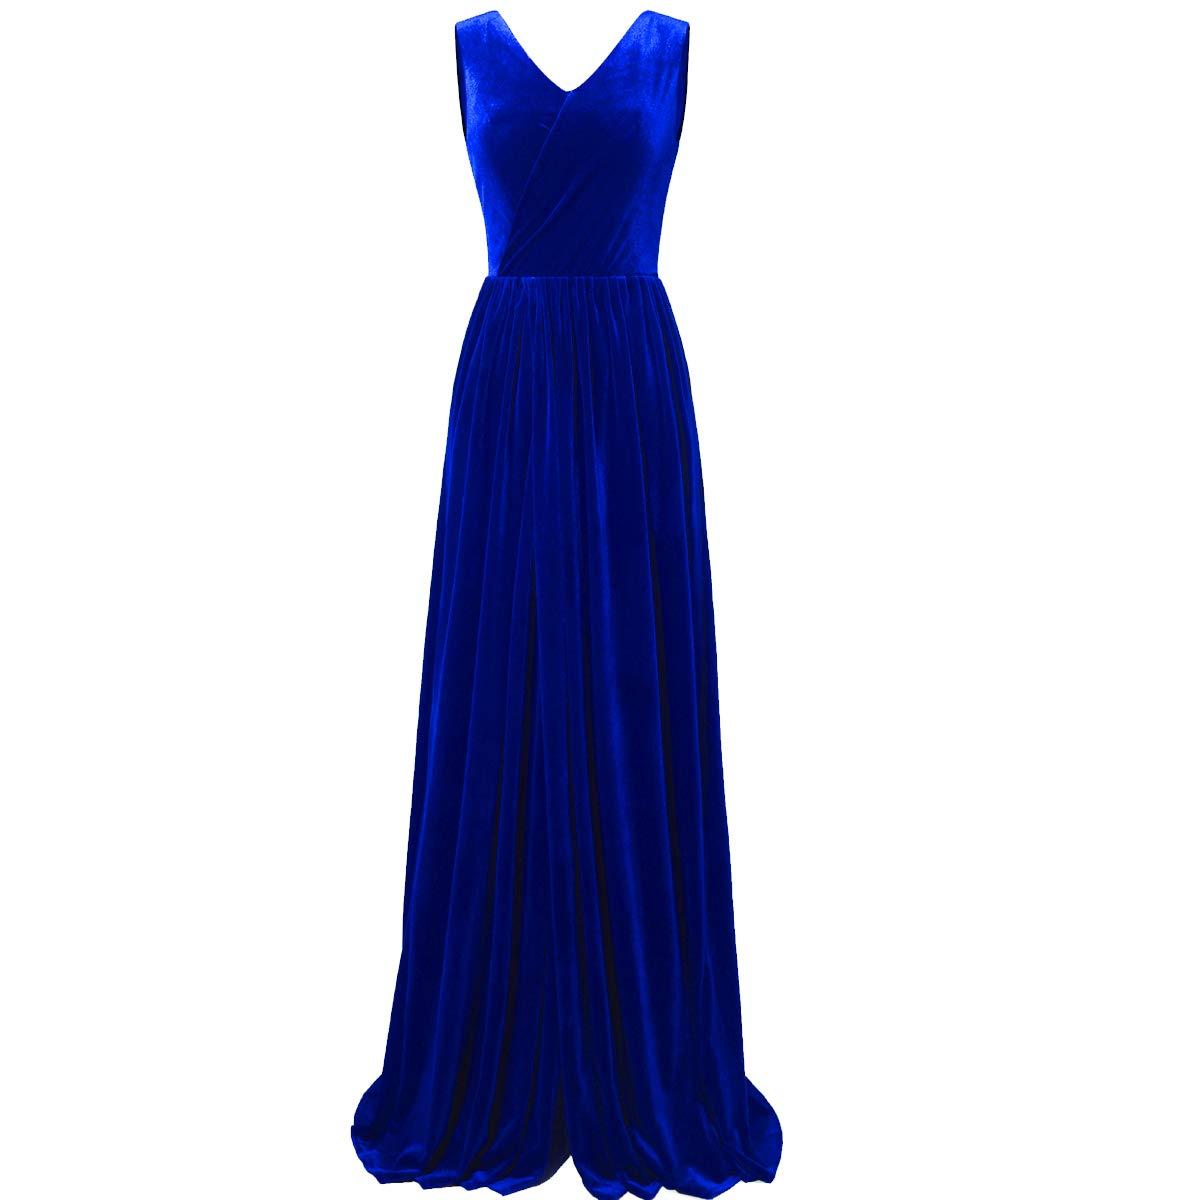 Royal bluee TTYbridal VNeck Split Side Velvet Prom Dresses Backless Long Evening Party Gown with Belt